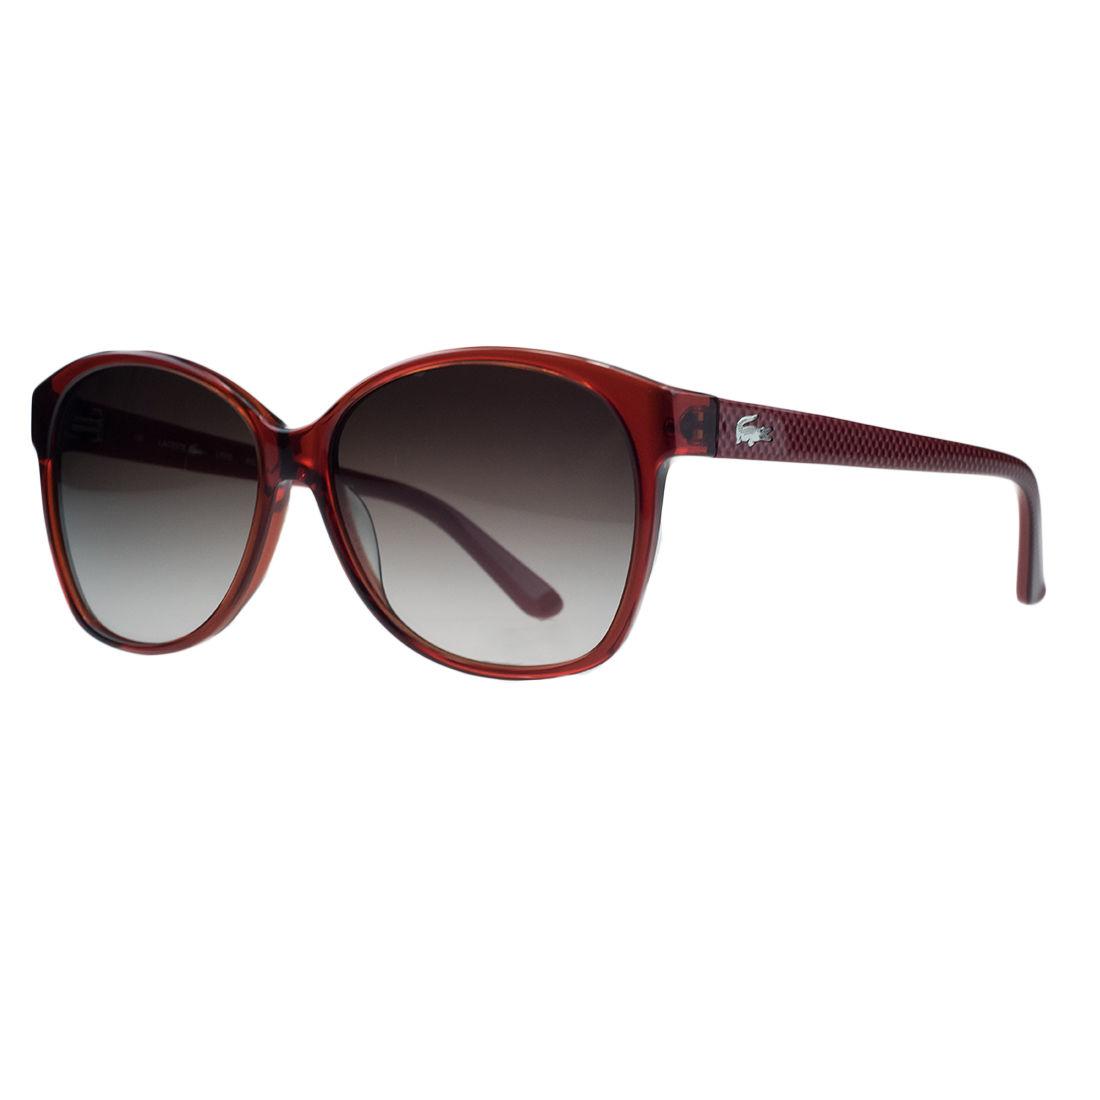 Lacoste L701/S 615 Red Wayfarer Sunglasses